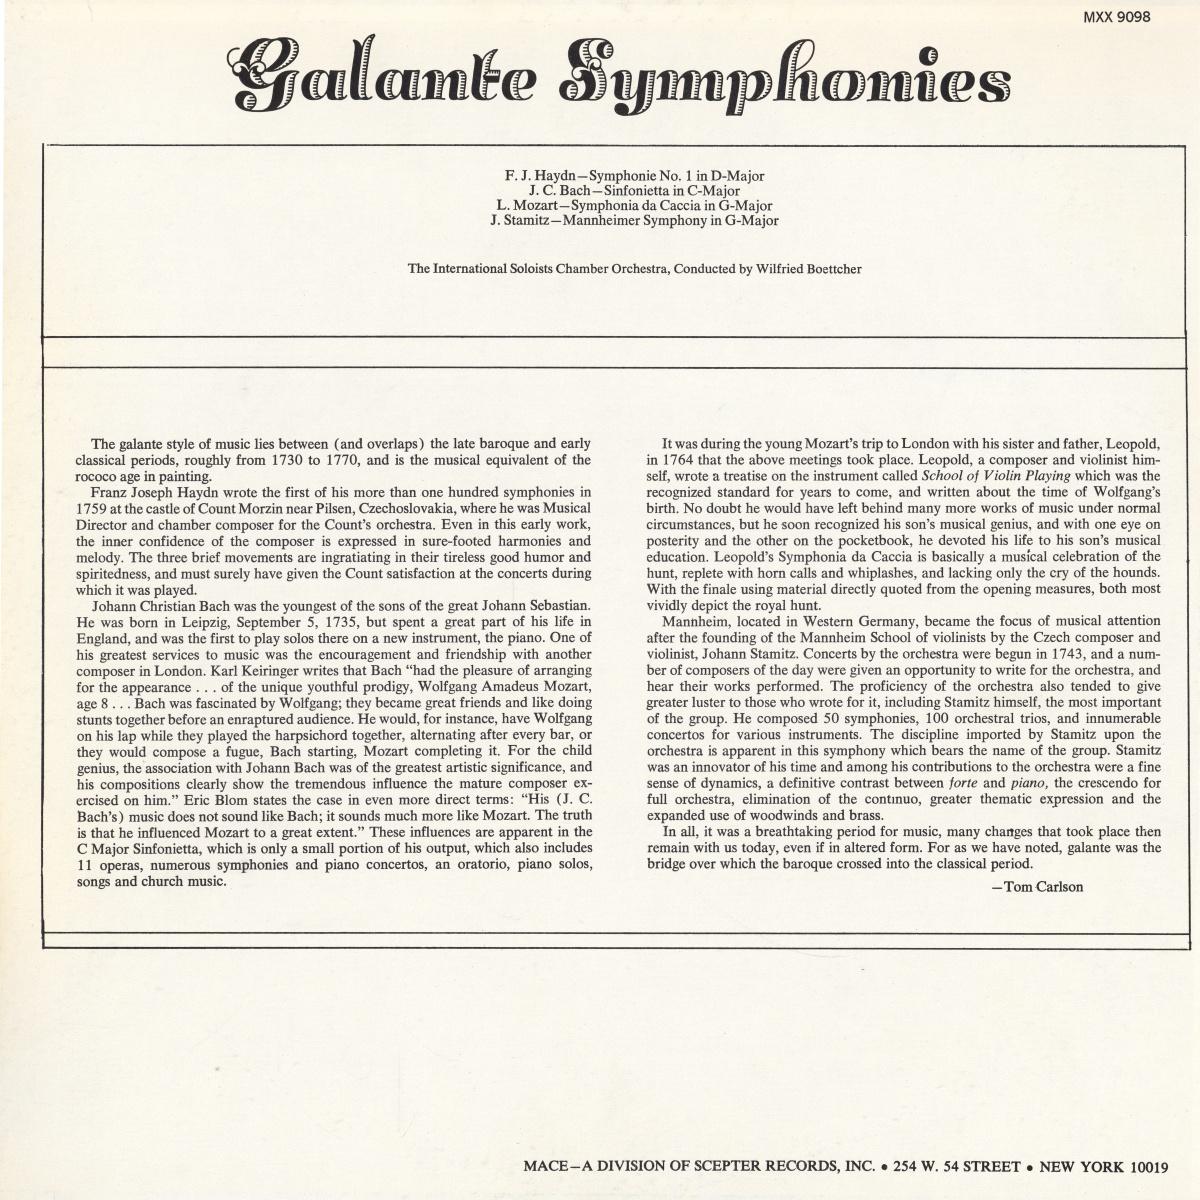 Verso de la pochette du disque MACE 9098